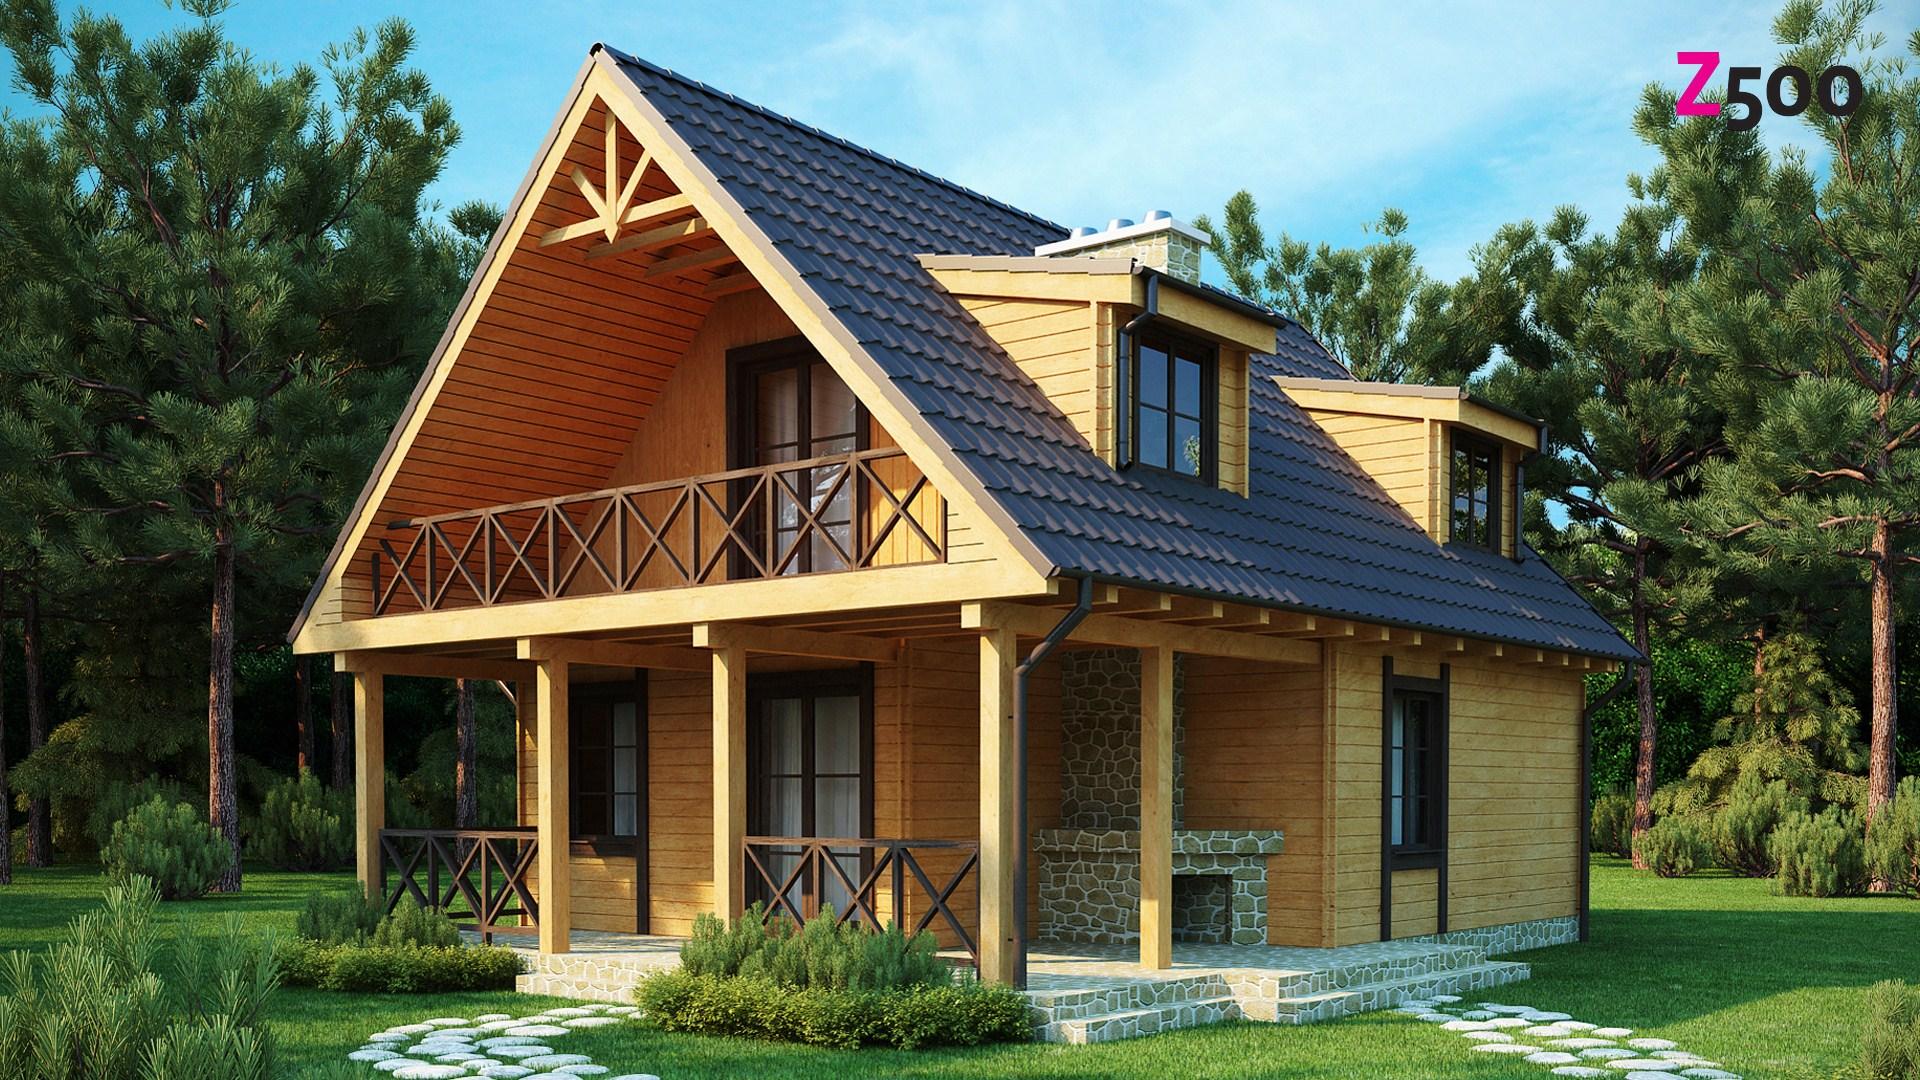 Проект мансардного дома из клееного бруса m14-152-1 тцст.